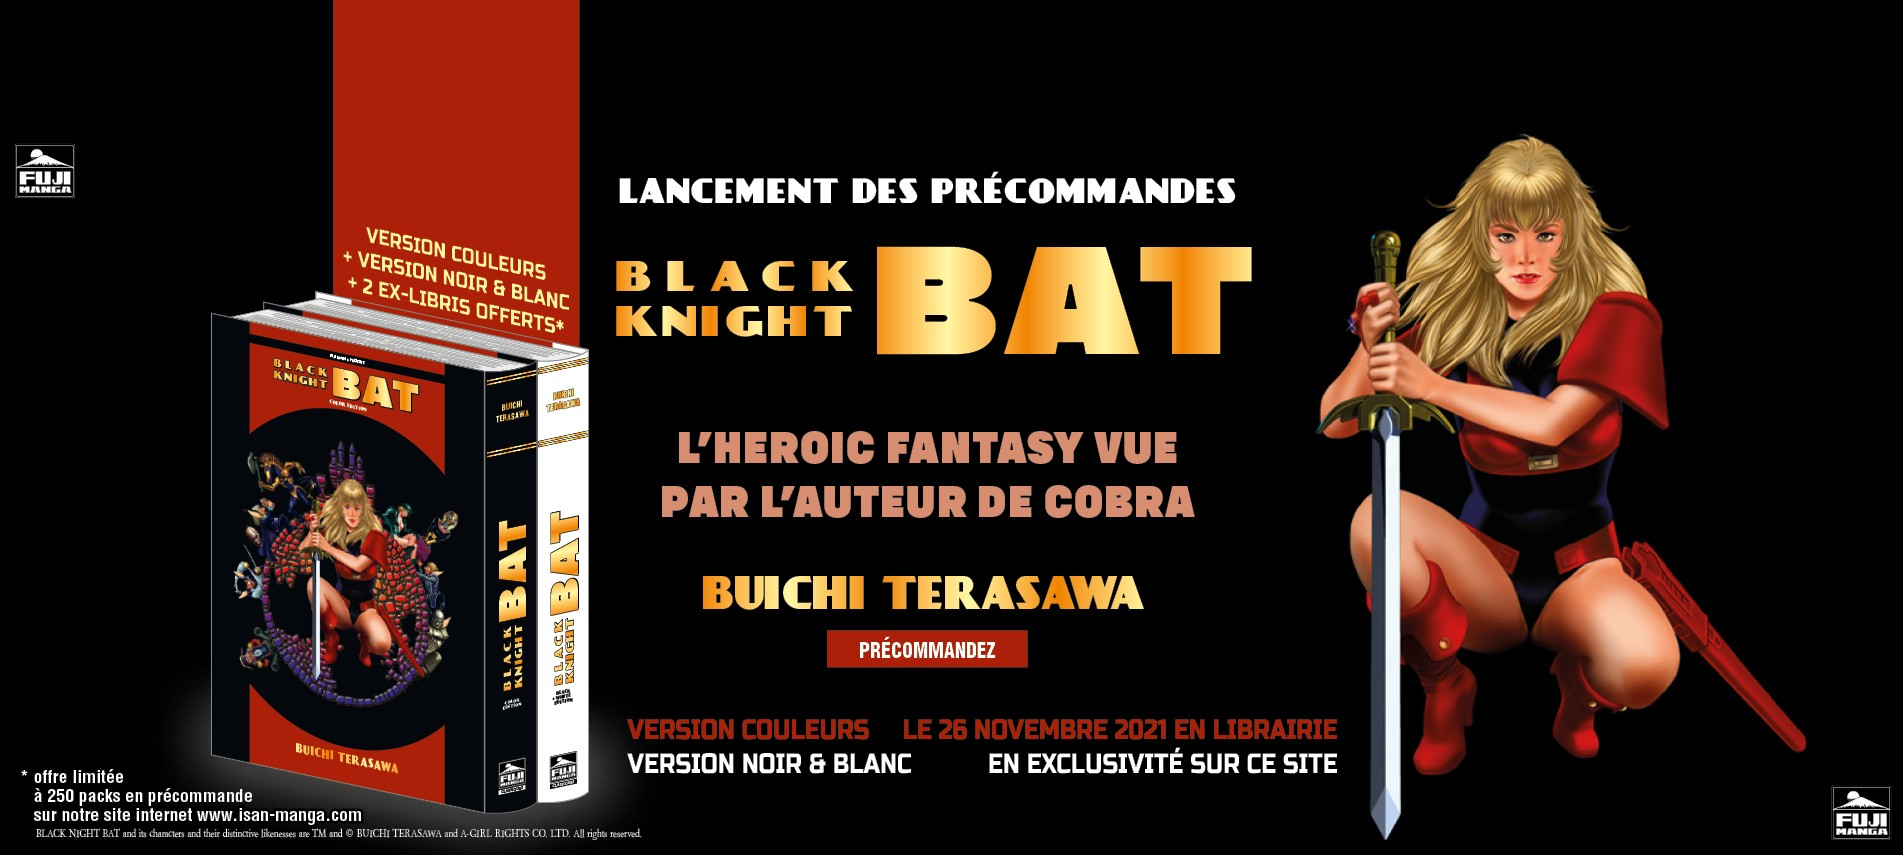 Black Knight BAT : l'Heroic Fantasy vu par Buichi TERASAWA